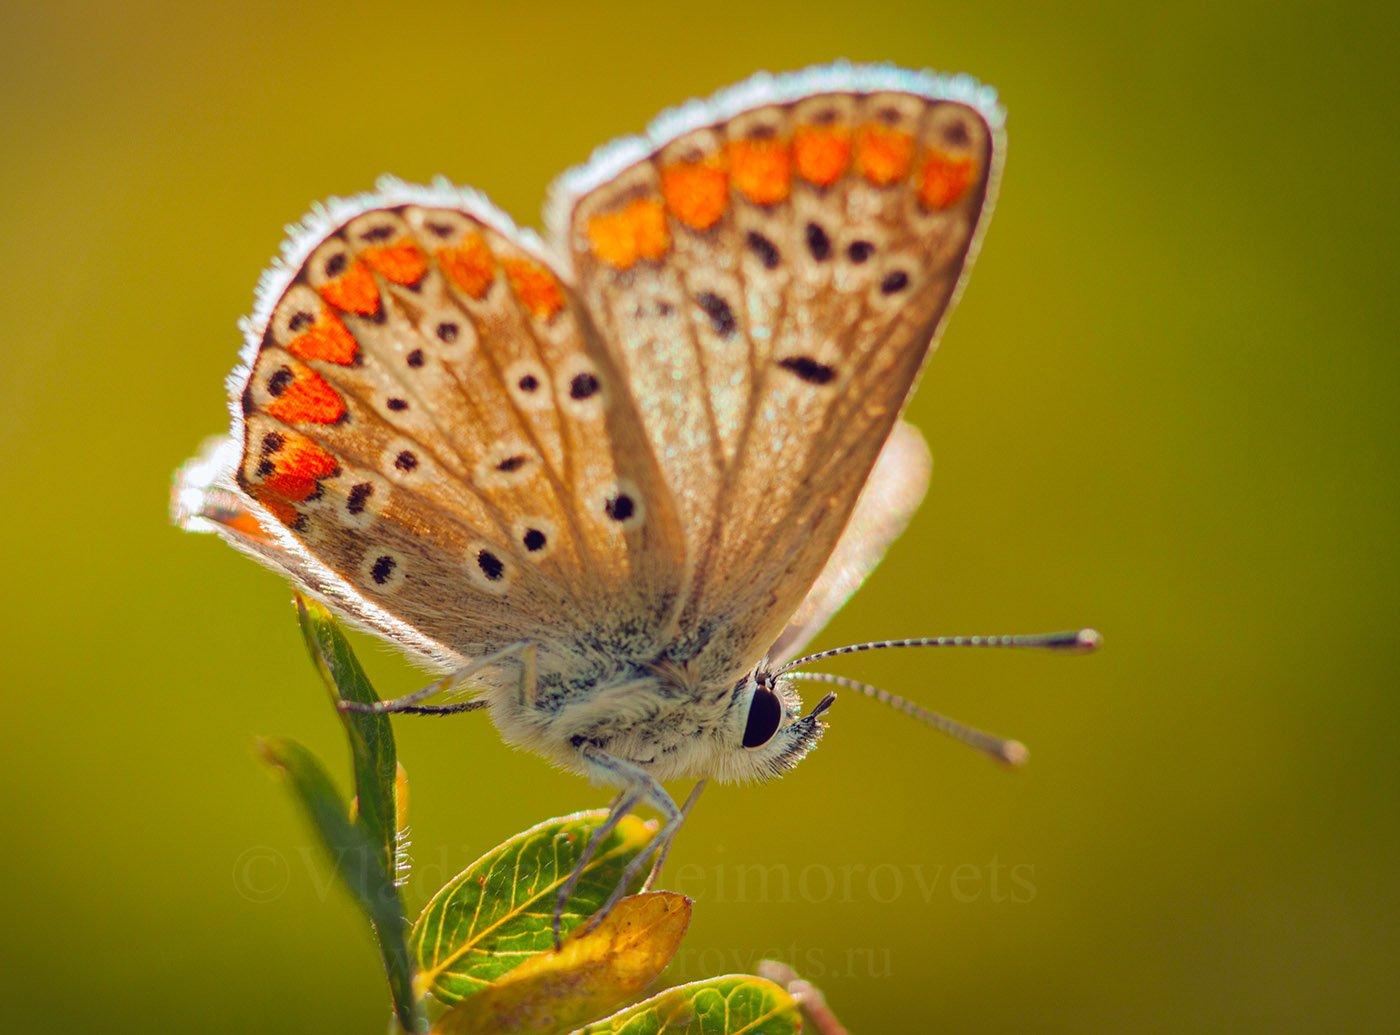 Lycaenidae, gossamer-winged butterfly, butterfly, insect, lepidoptera, summer, sunlight, Russia, Northwestern Caucasus, Krasnodar Territory, Ilsky, Владимир Нейморовец